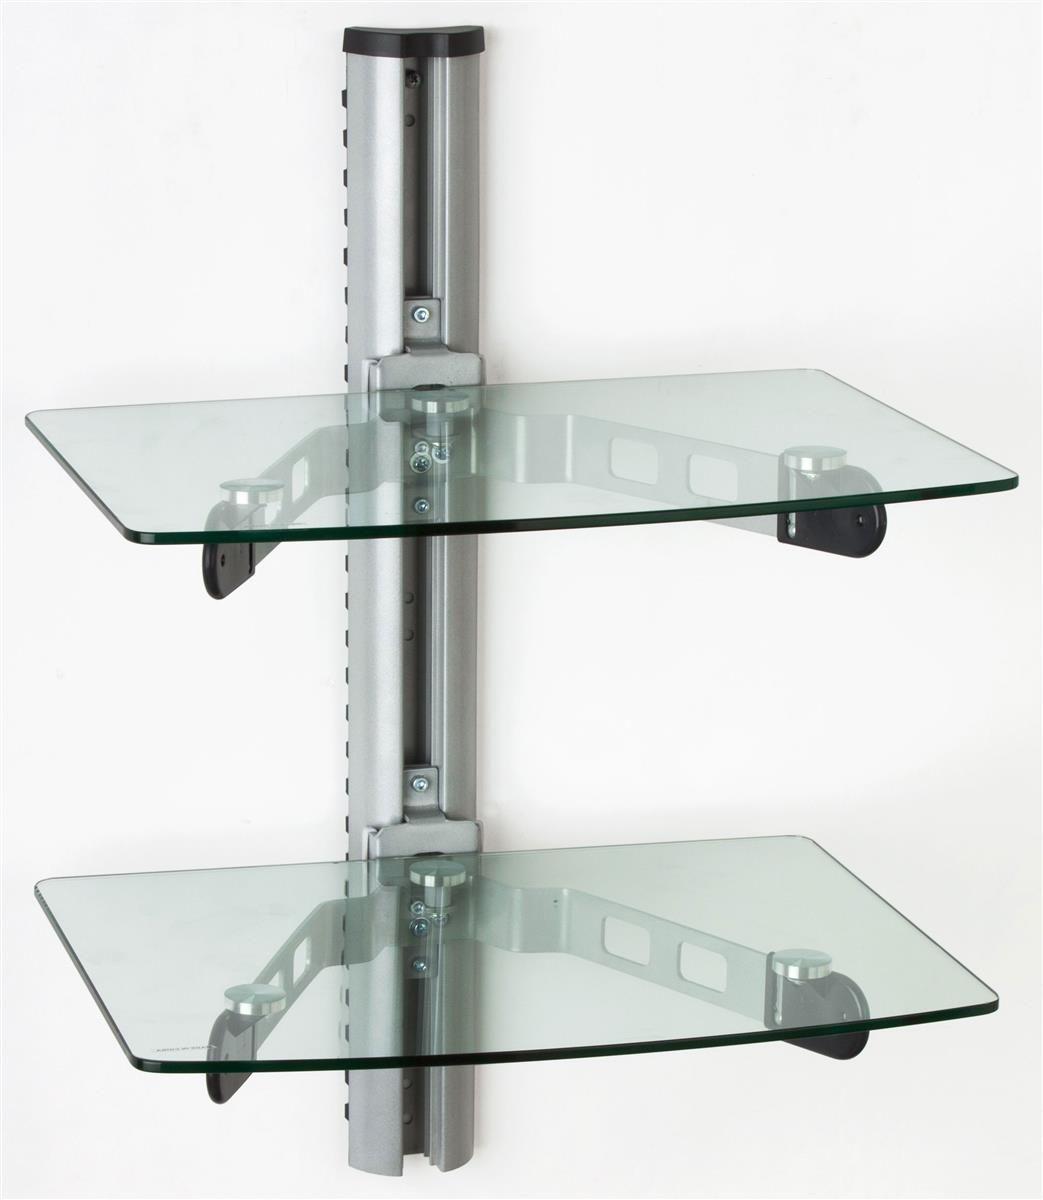 Glass Tv Shelf For Wall Mount Adjustable In Post Cable Management Glass Shelves Kitchen Glass Shelves Glass Shelf Brackets